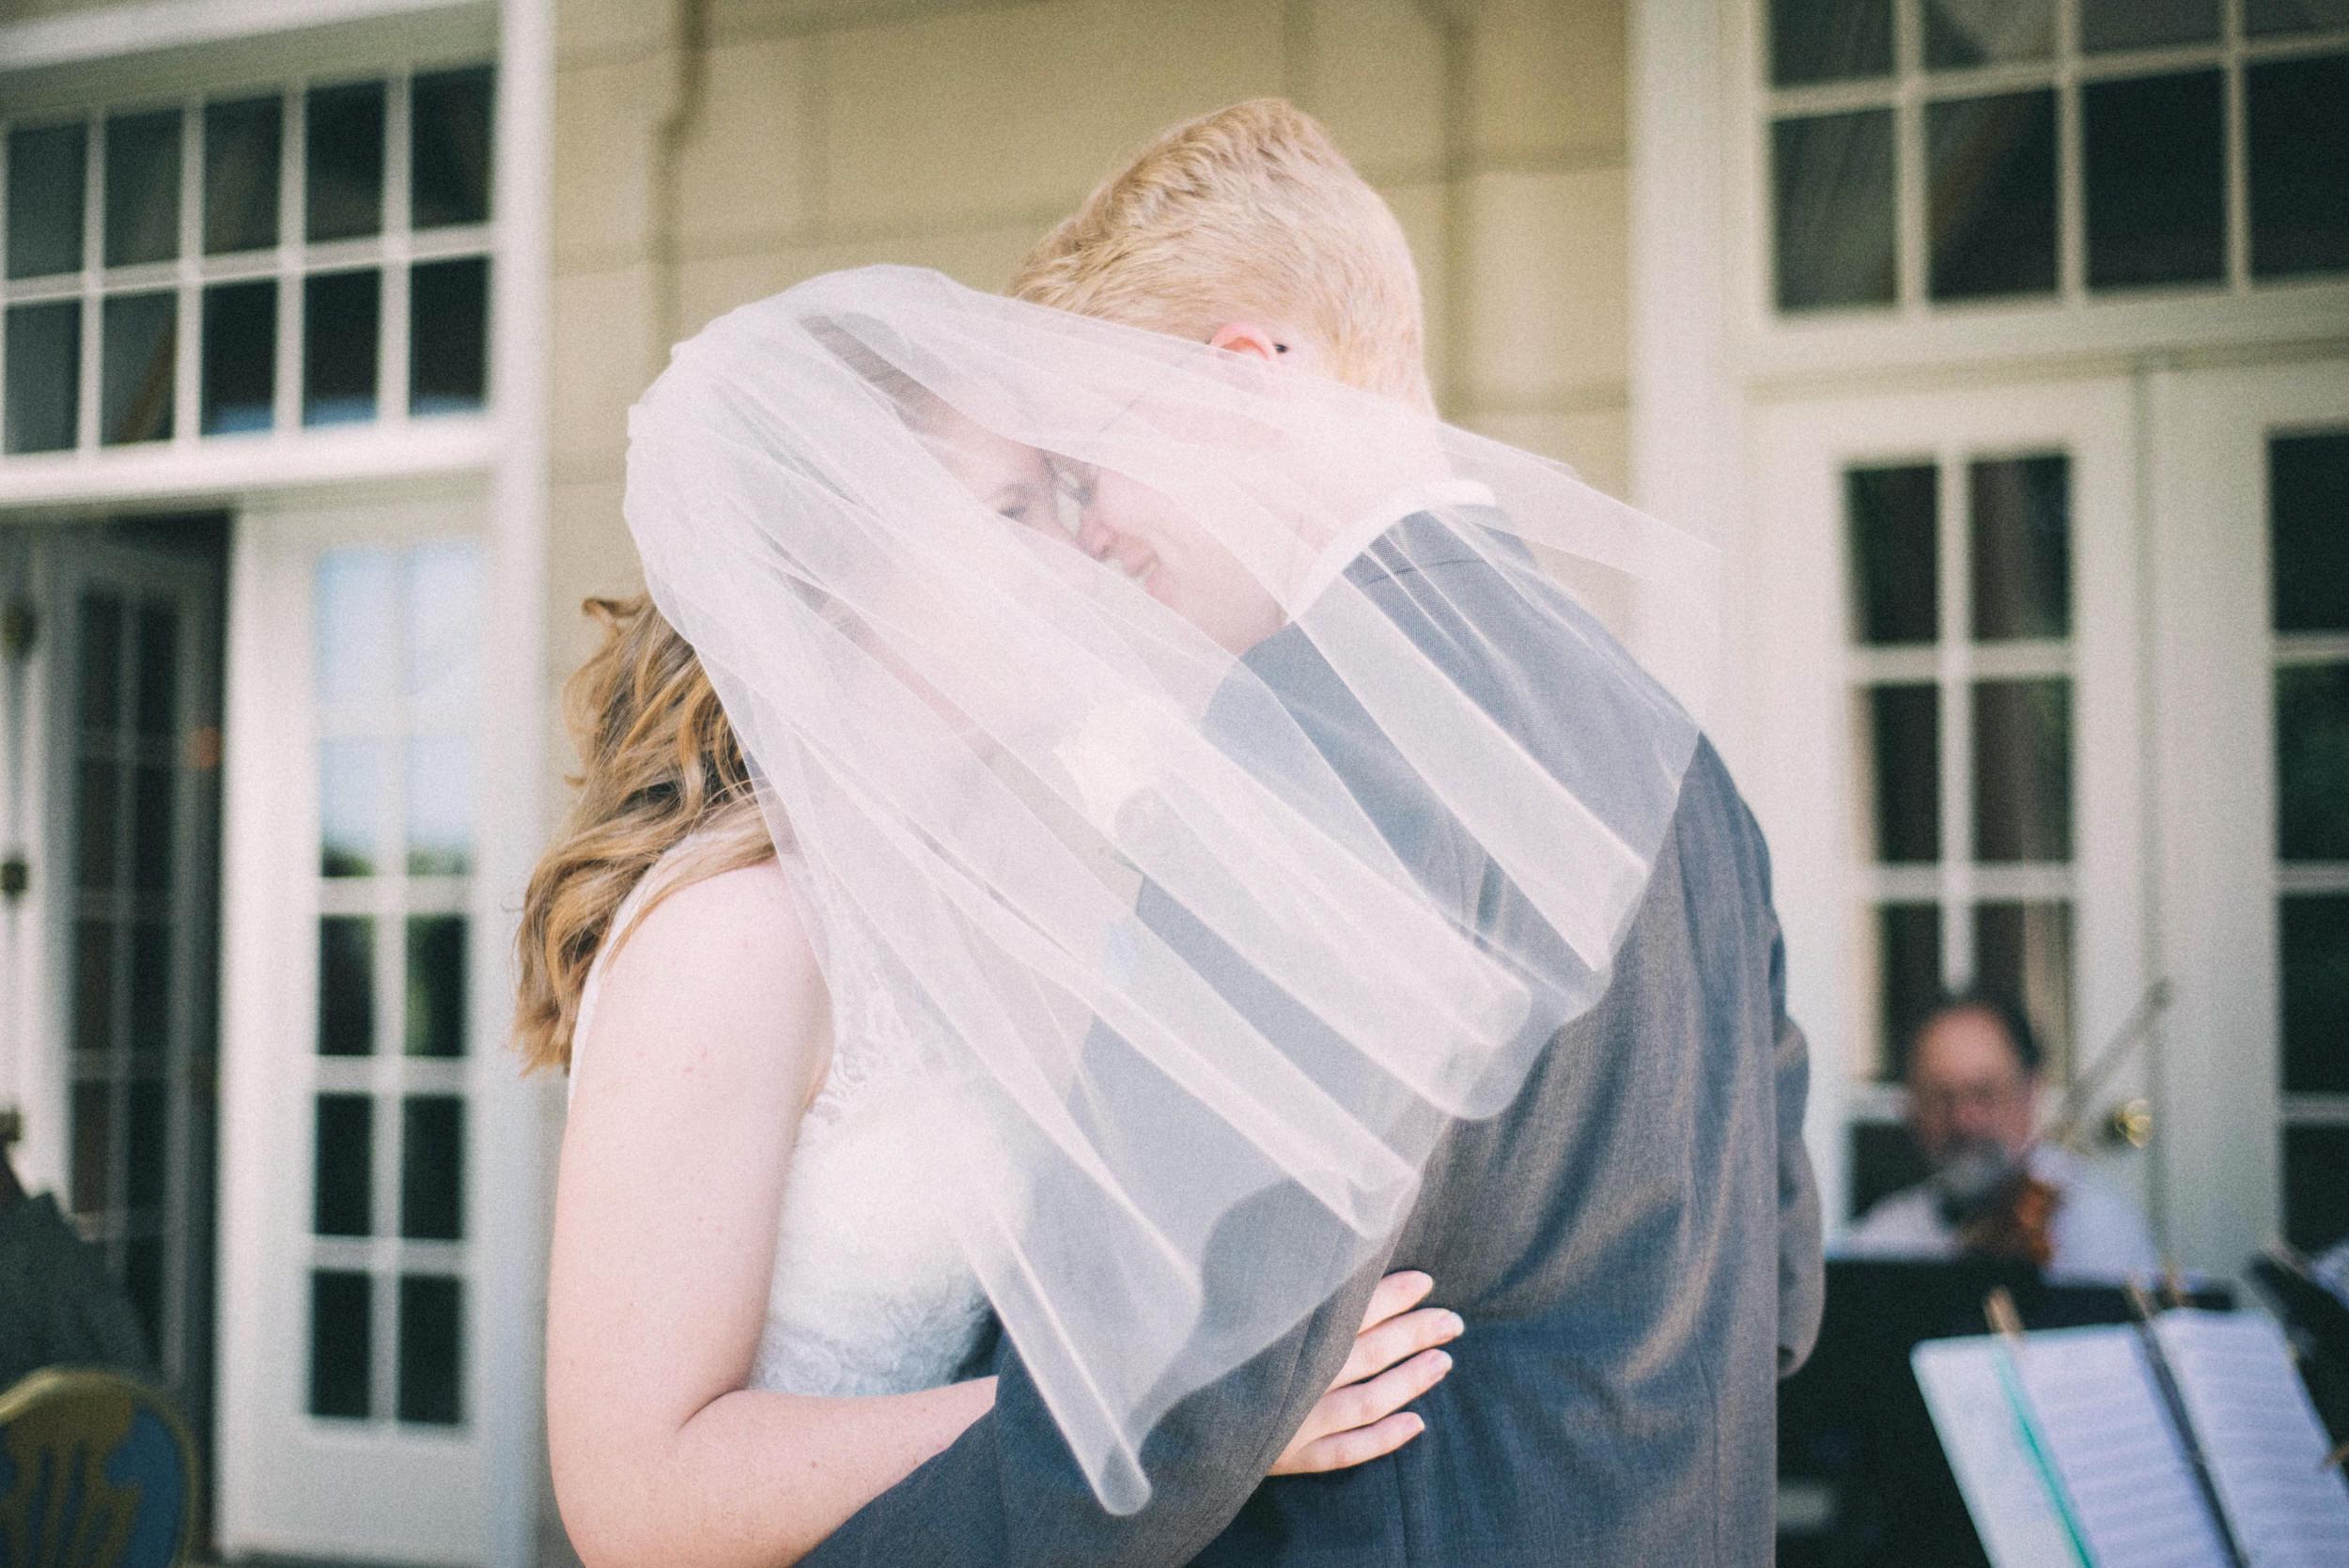 Jenna-Patrick-Garden-Court-Presbyterian-Seminary-Wedding-Louisville-Kentucky-Sarah-Katherine-Davis-Photography-9.jpg